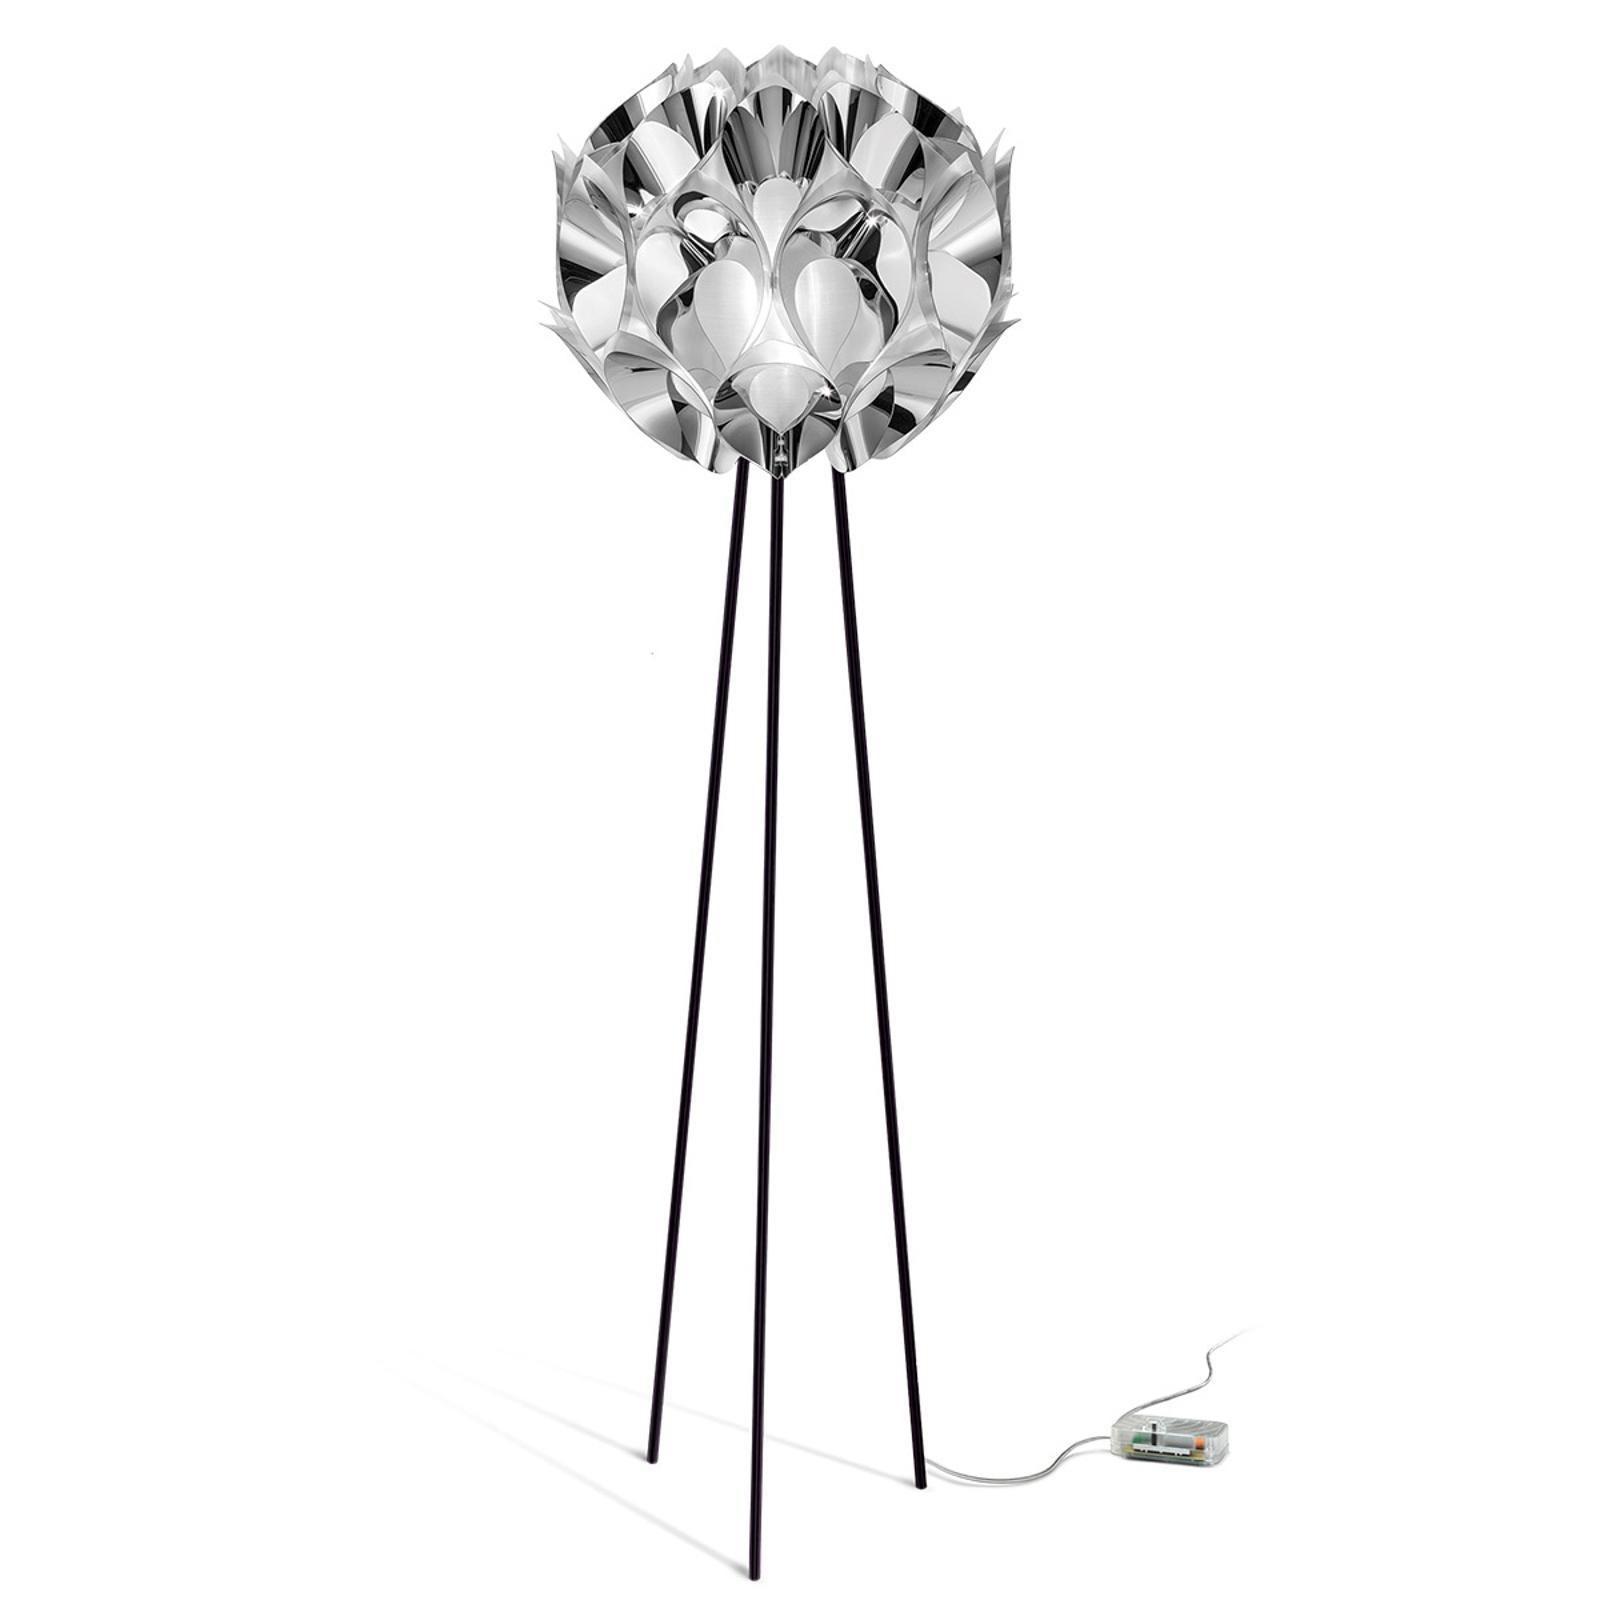 Designerska lampa stojąca FLORA, srebrna